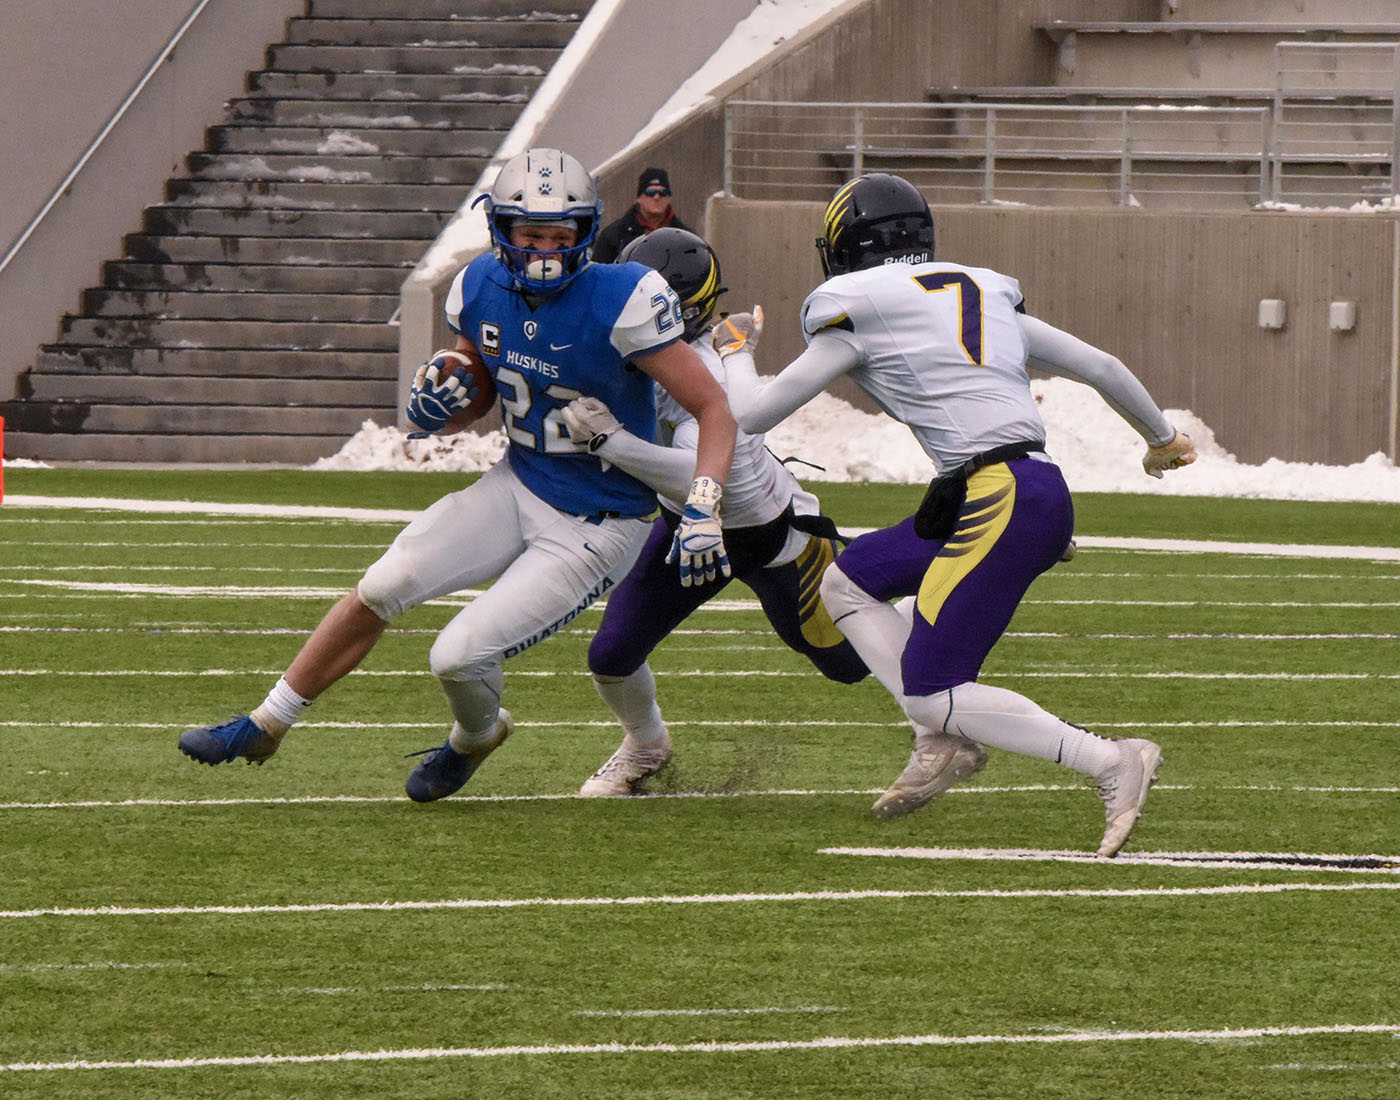 Jason Williamson  ran in five touchdowns against the Chaska Hawks.